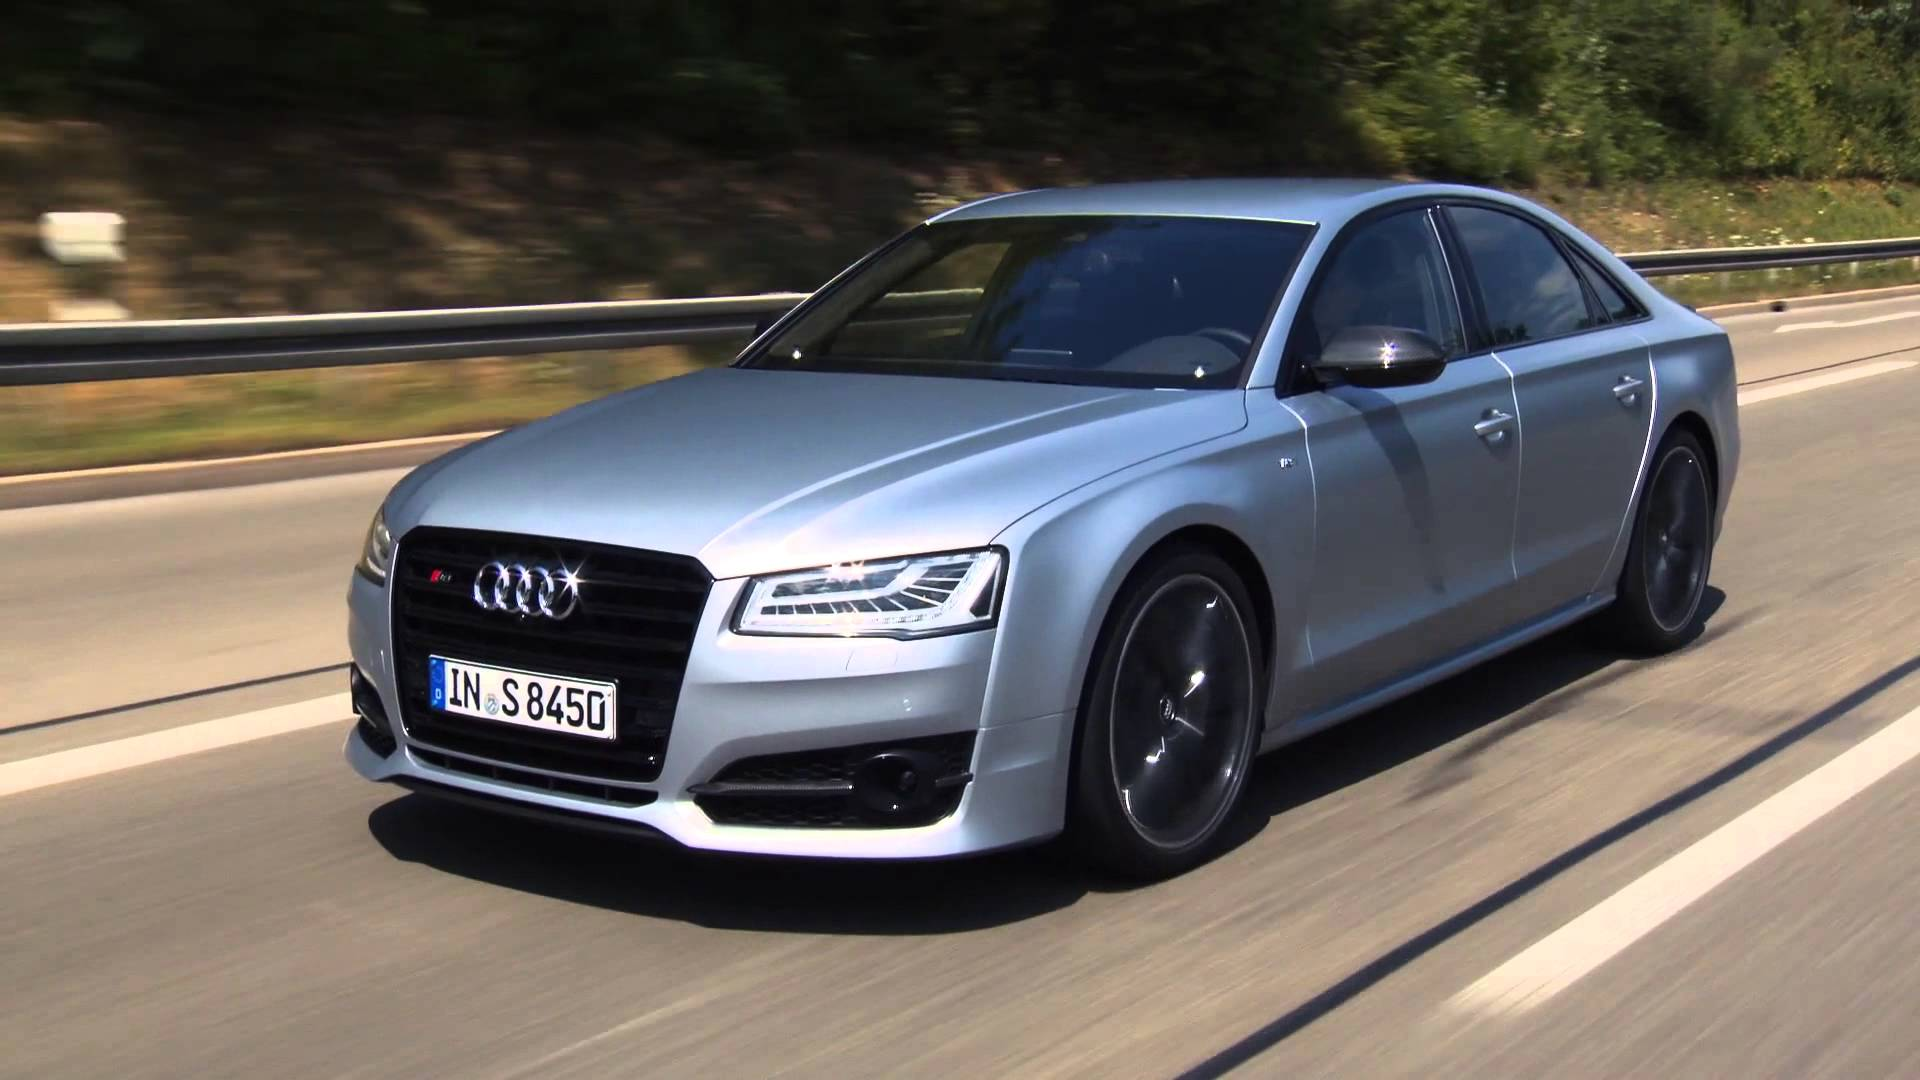 Ultimate Sleeper Car - Audi S8 Plus